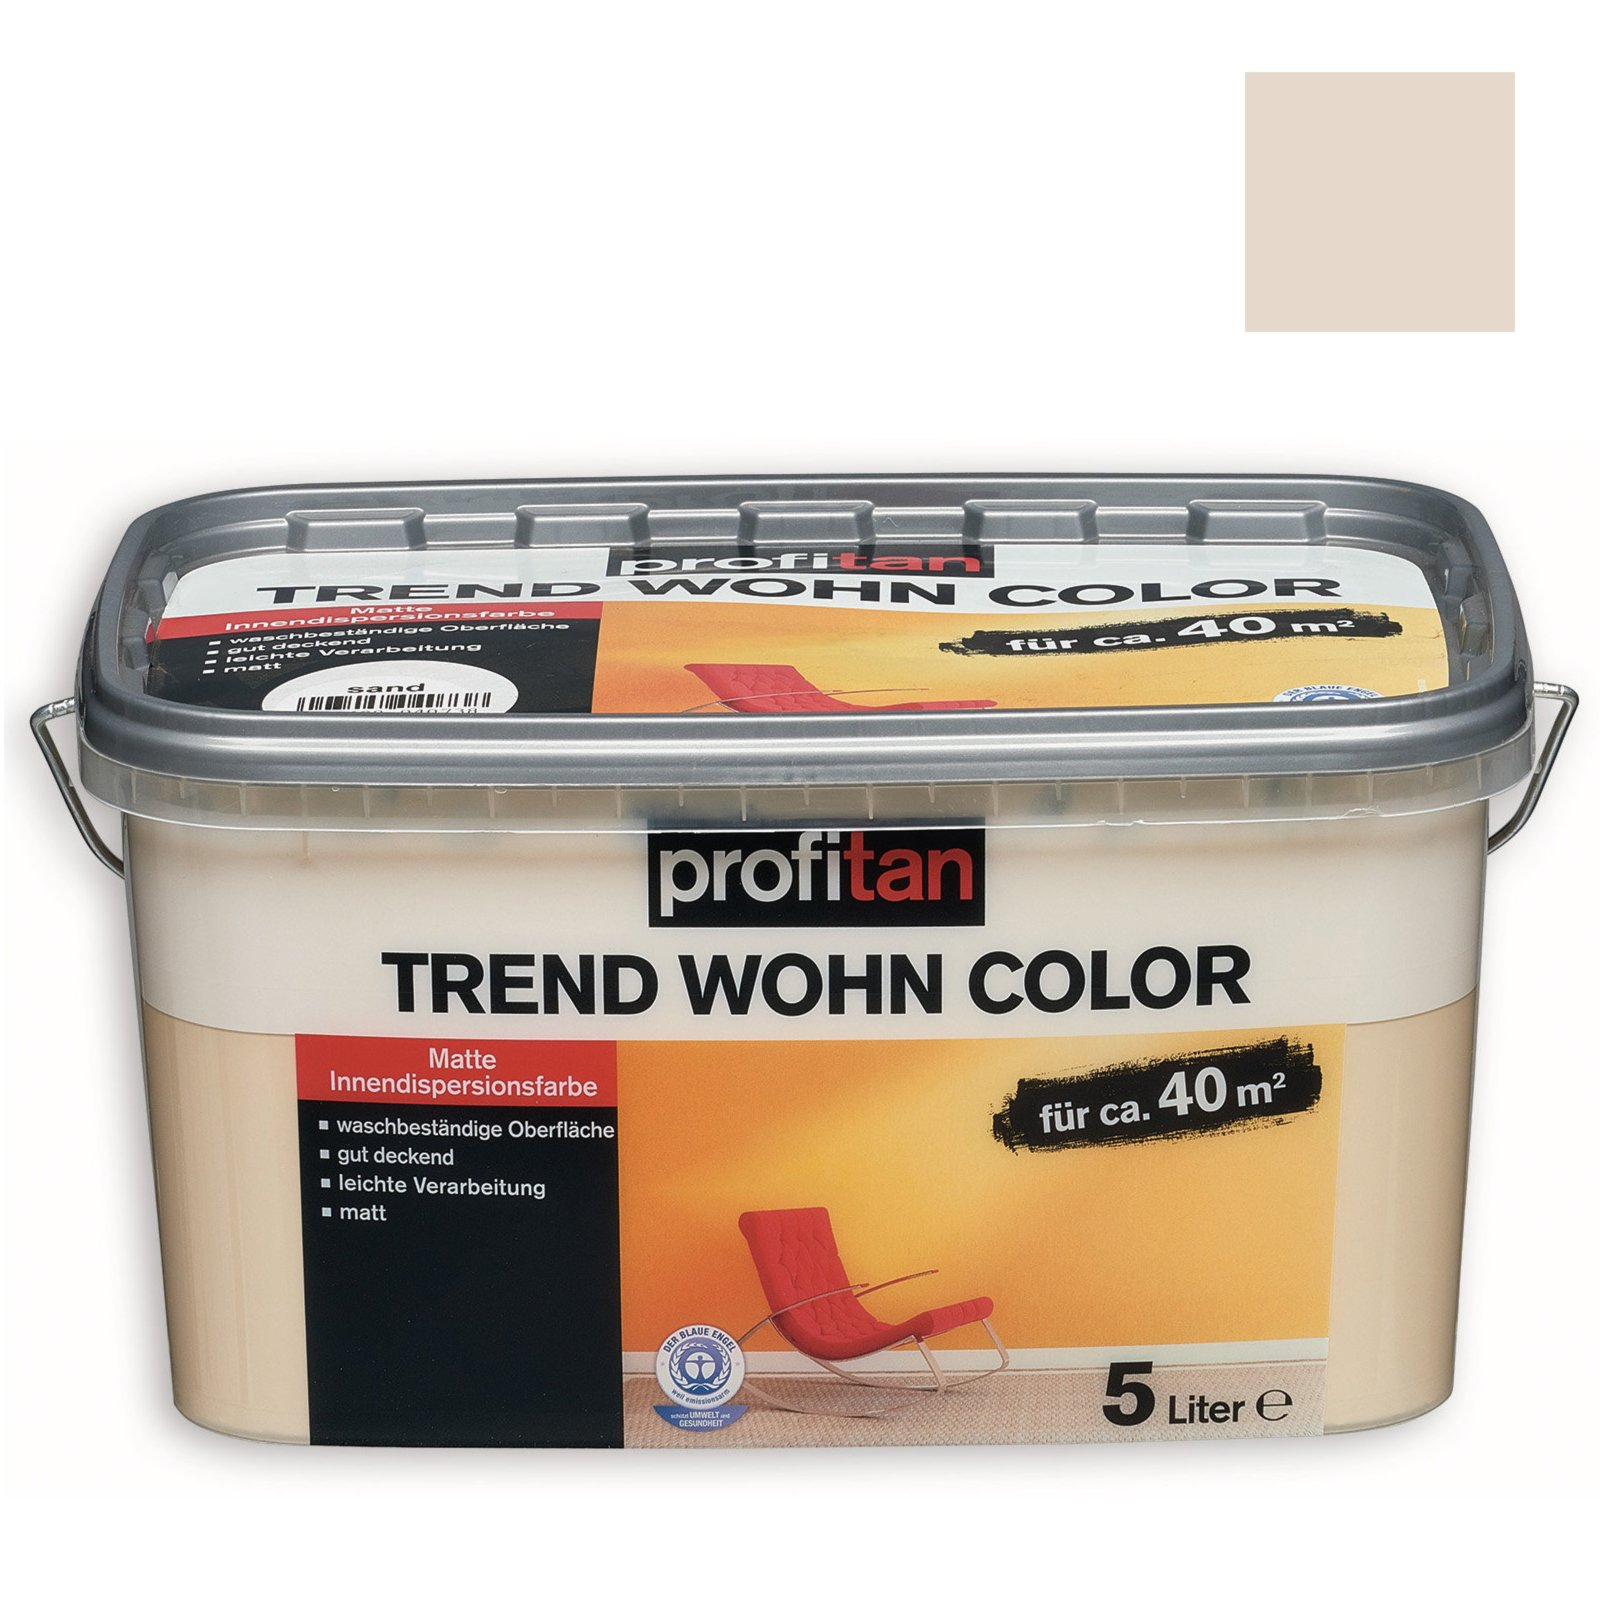 profitan wandfarbe trend wohn color mandelsplitter matt 5 liter wandfarben deckenfarben. Black Bedroom Furniture Sets. Home Design Ideas